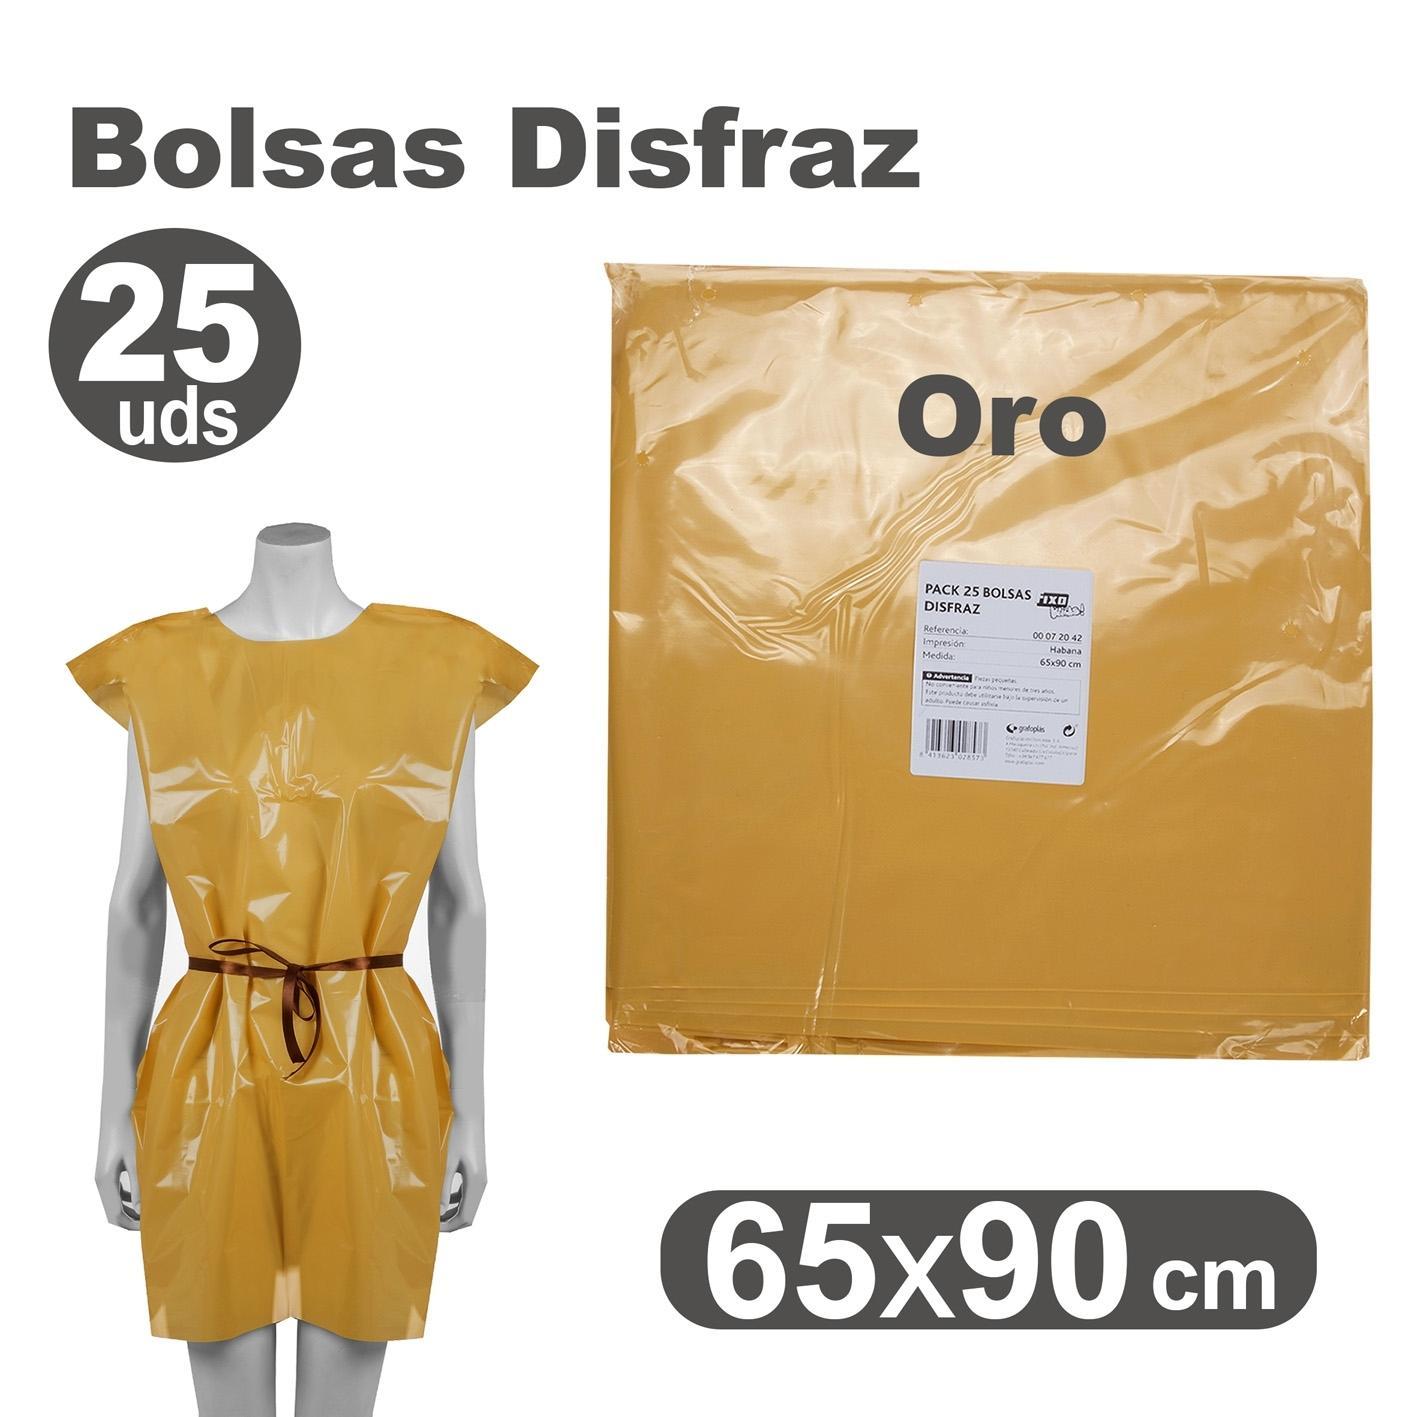 PACK 25 BOLSAS DISFRACES 65X90CM ORO